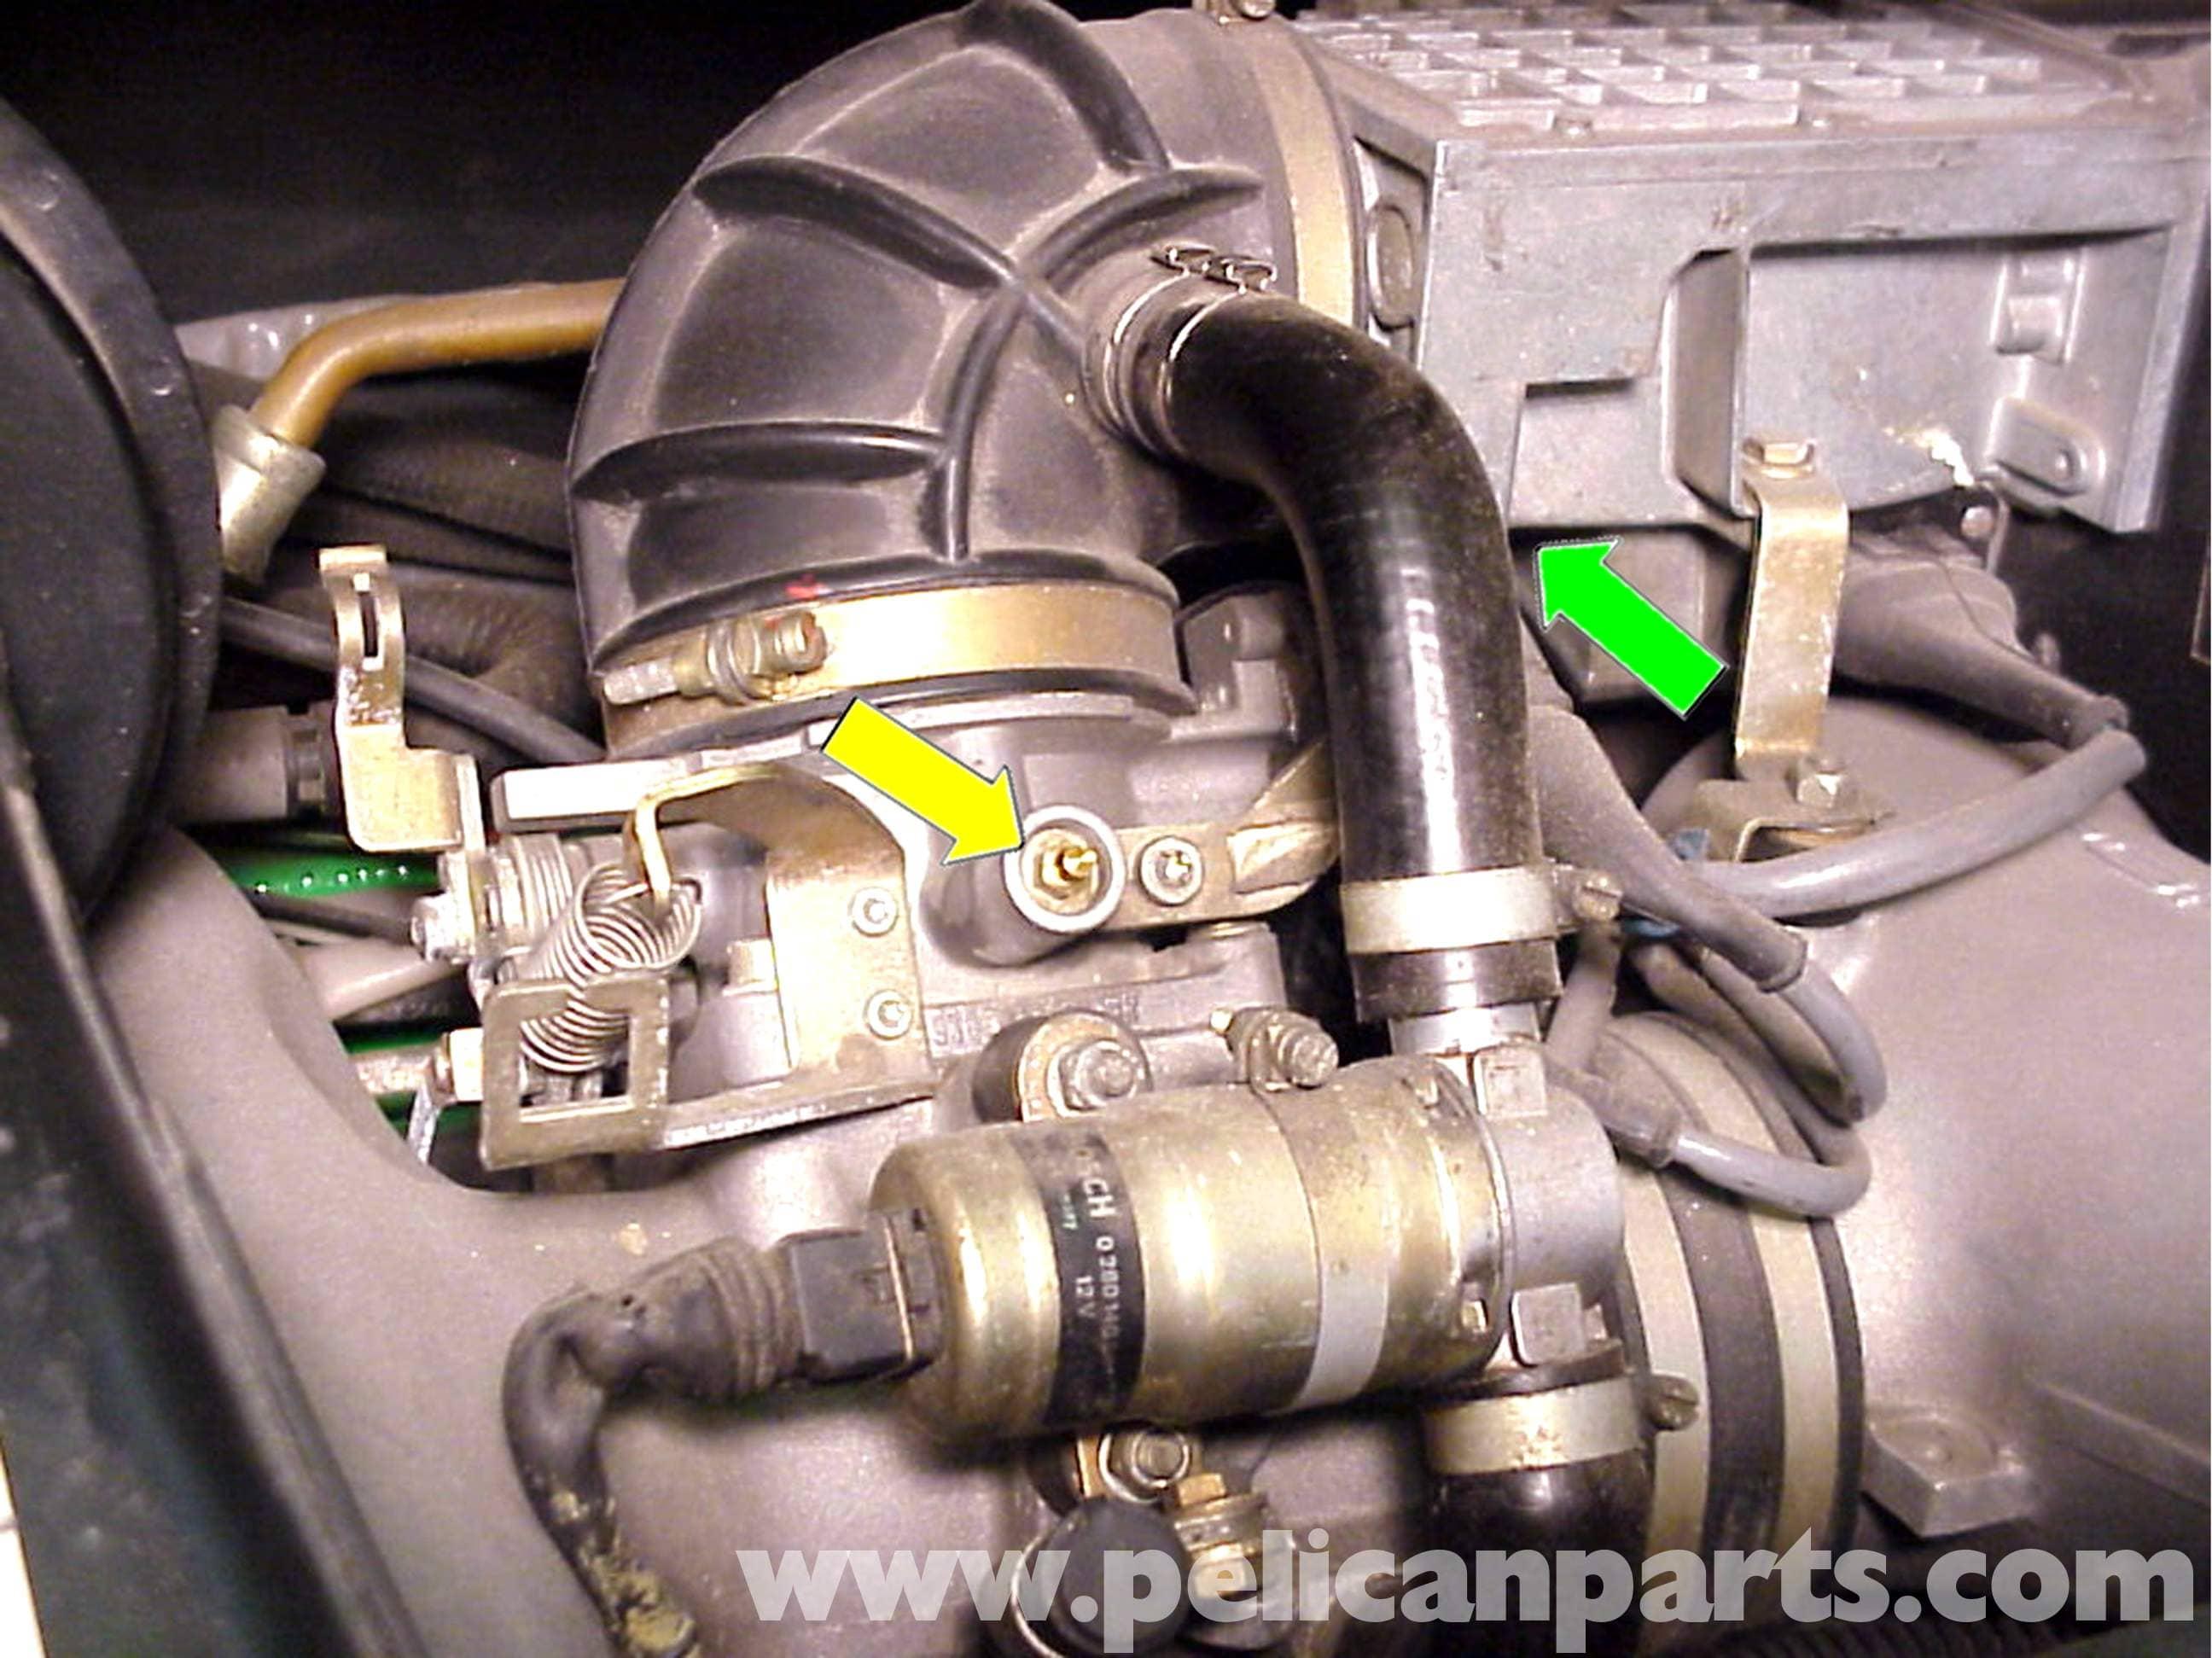 Porsche 911 Motronic Engine Management System Overview | 911 (1965